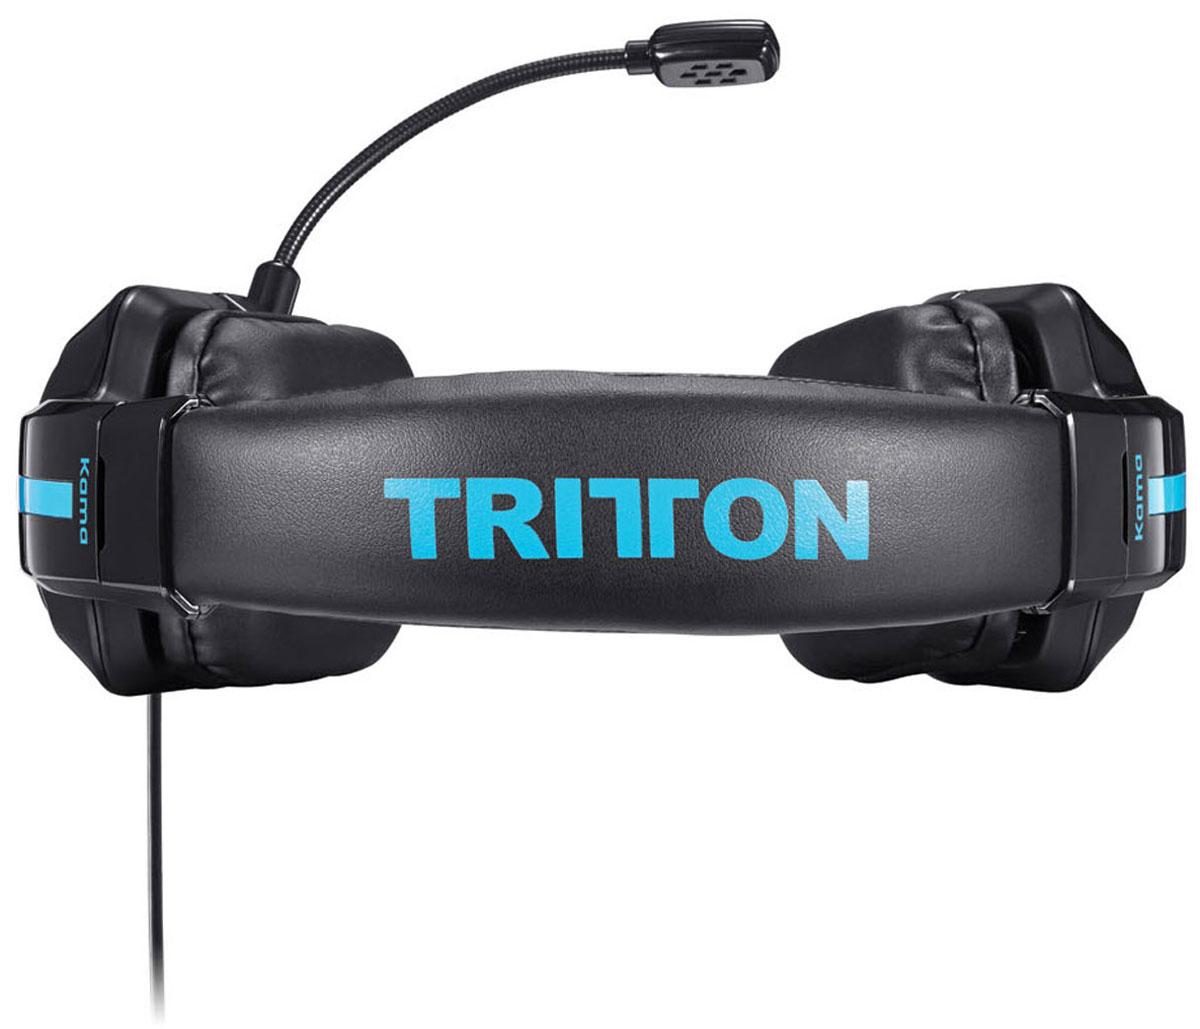 Tritton Kama Stereo Headset, Black игровая гарнитура PS4/PS Vita (TRI906390002/02/1)